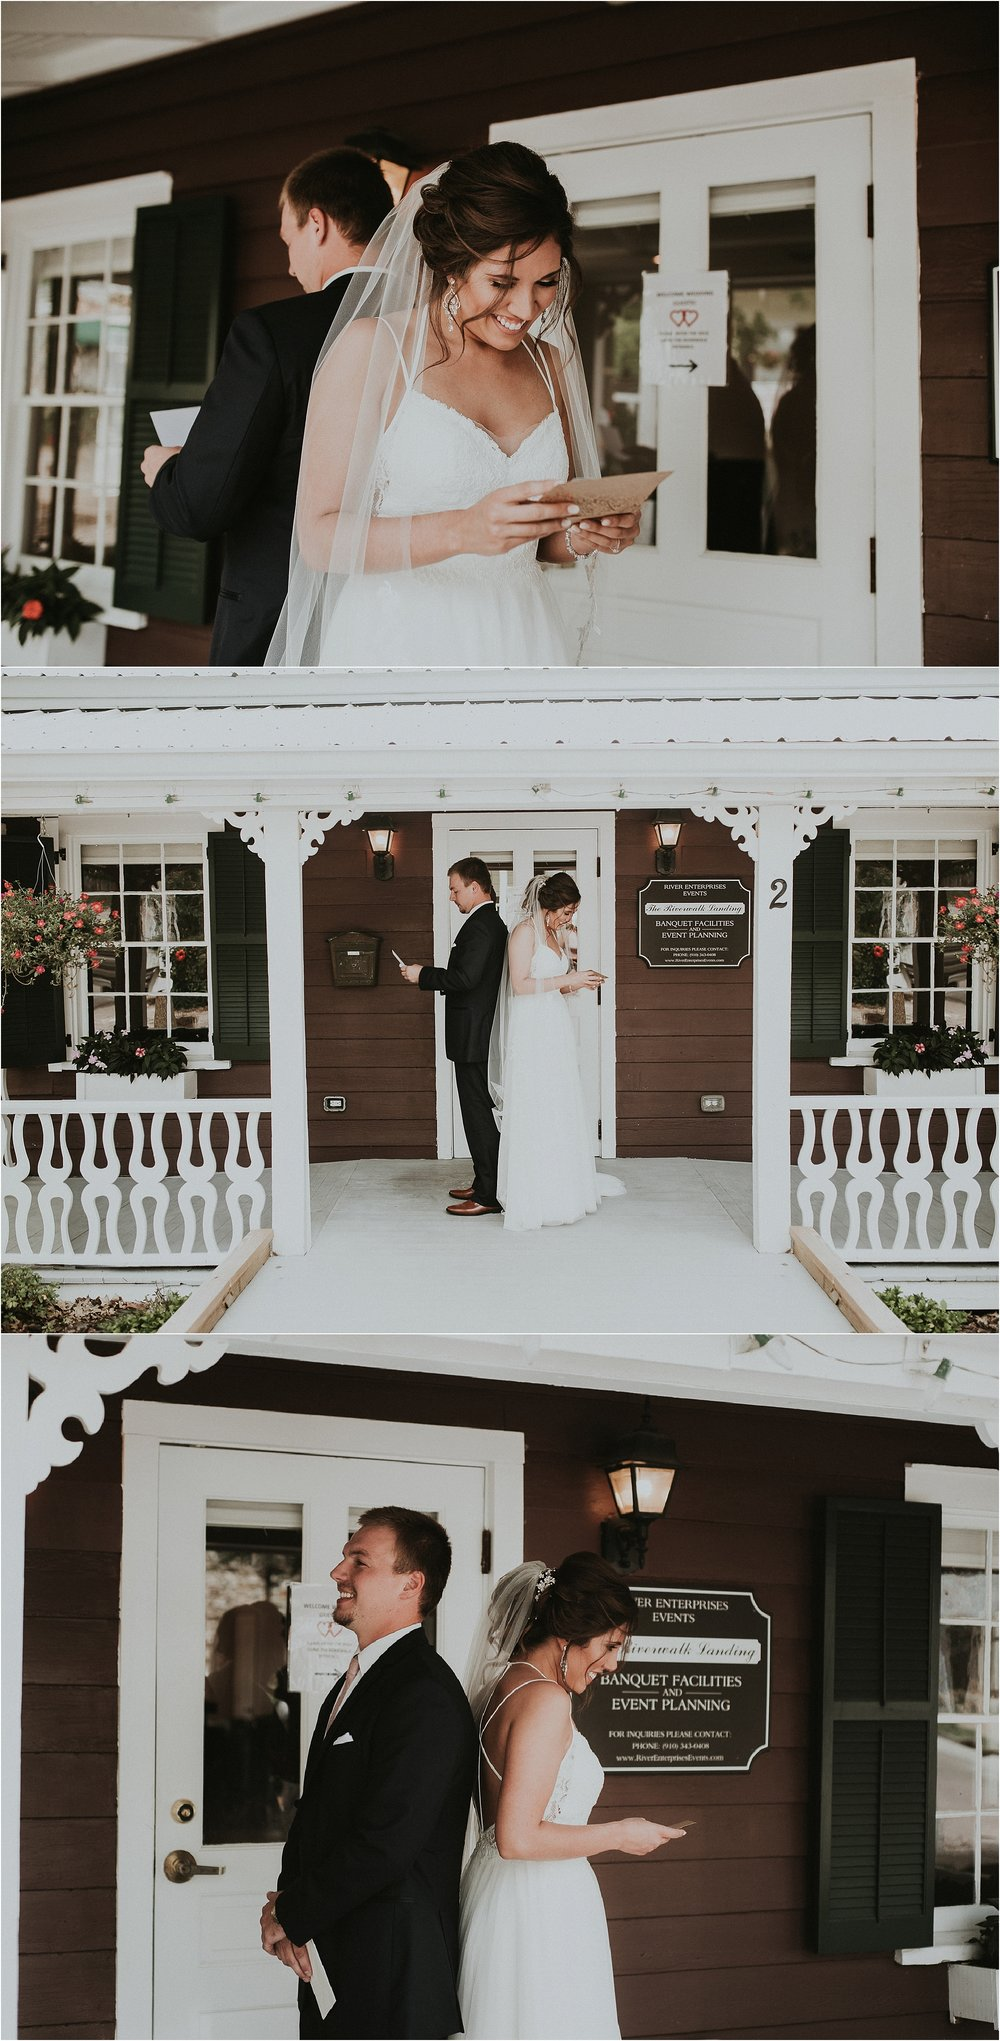 Riverwalk-Landing-wedding-wilmington-NC_0020.jpg